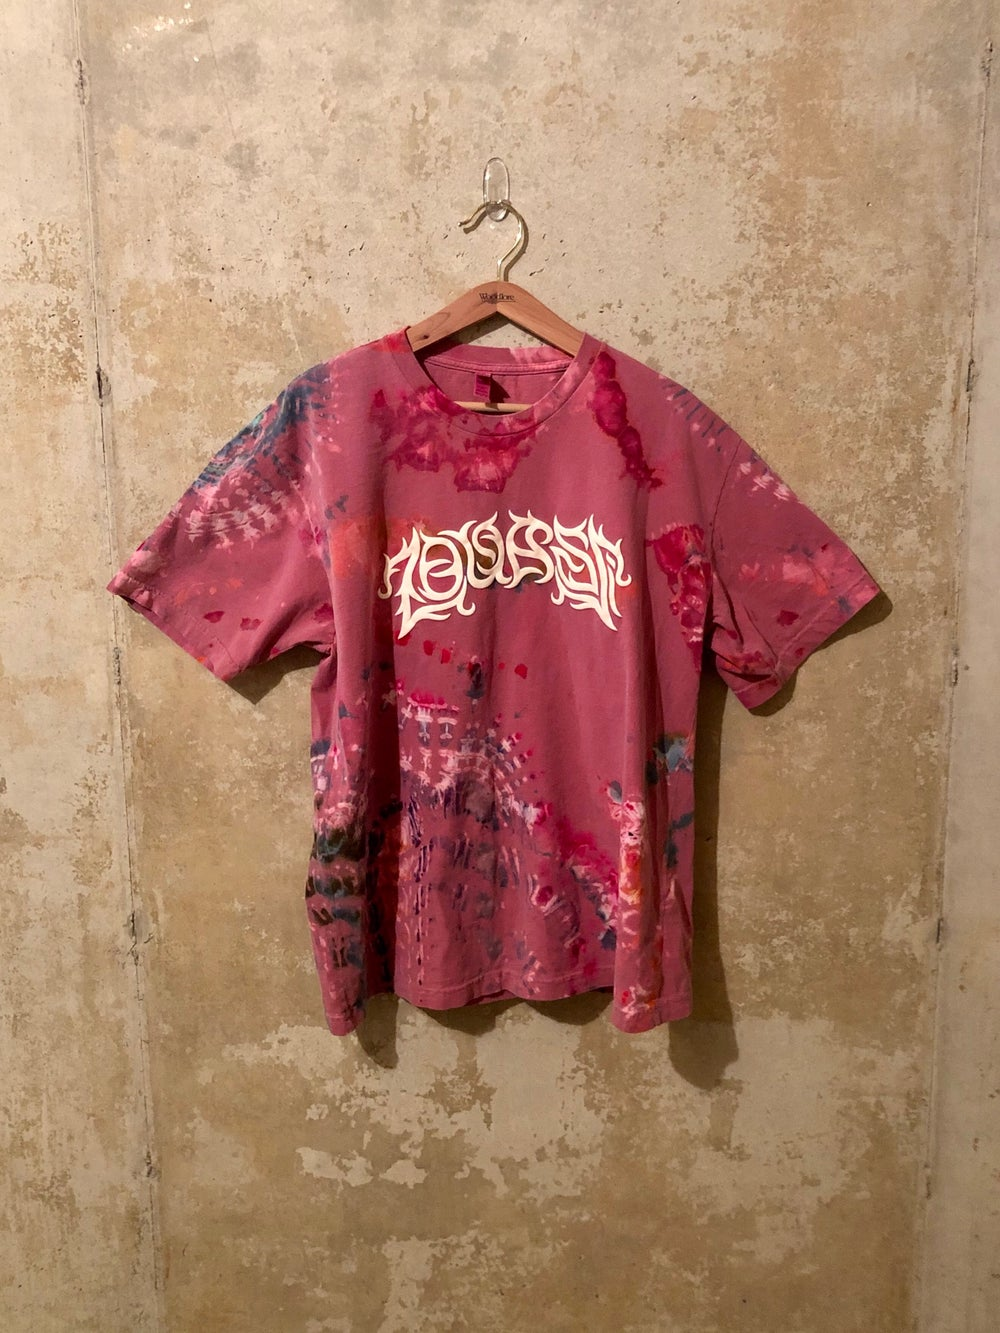 Medium Puff Print Tie Dye Shirt #7